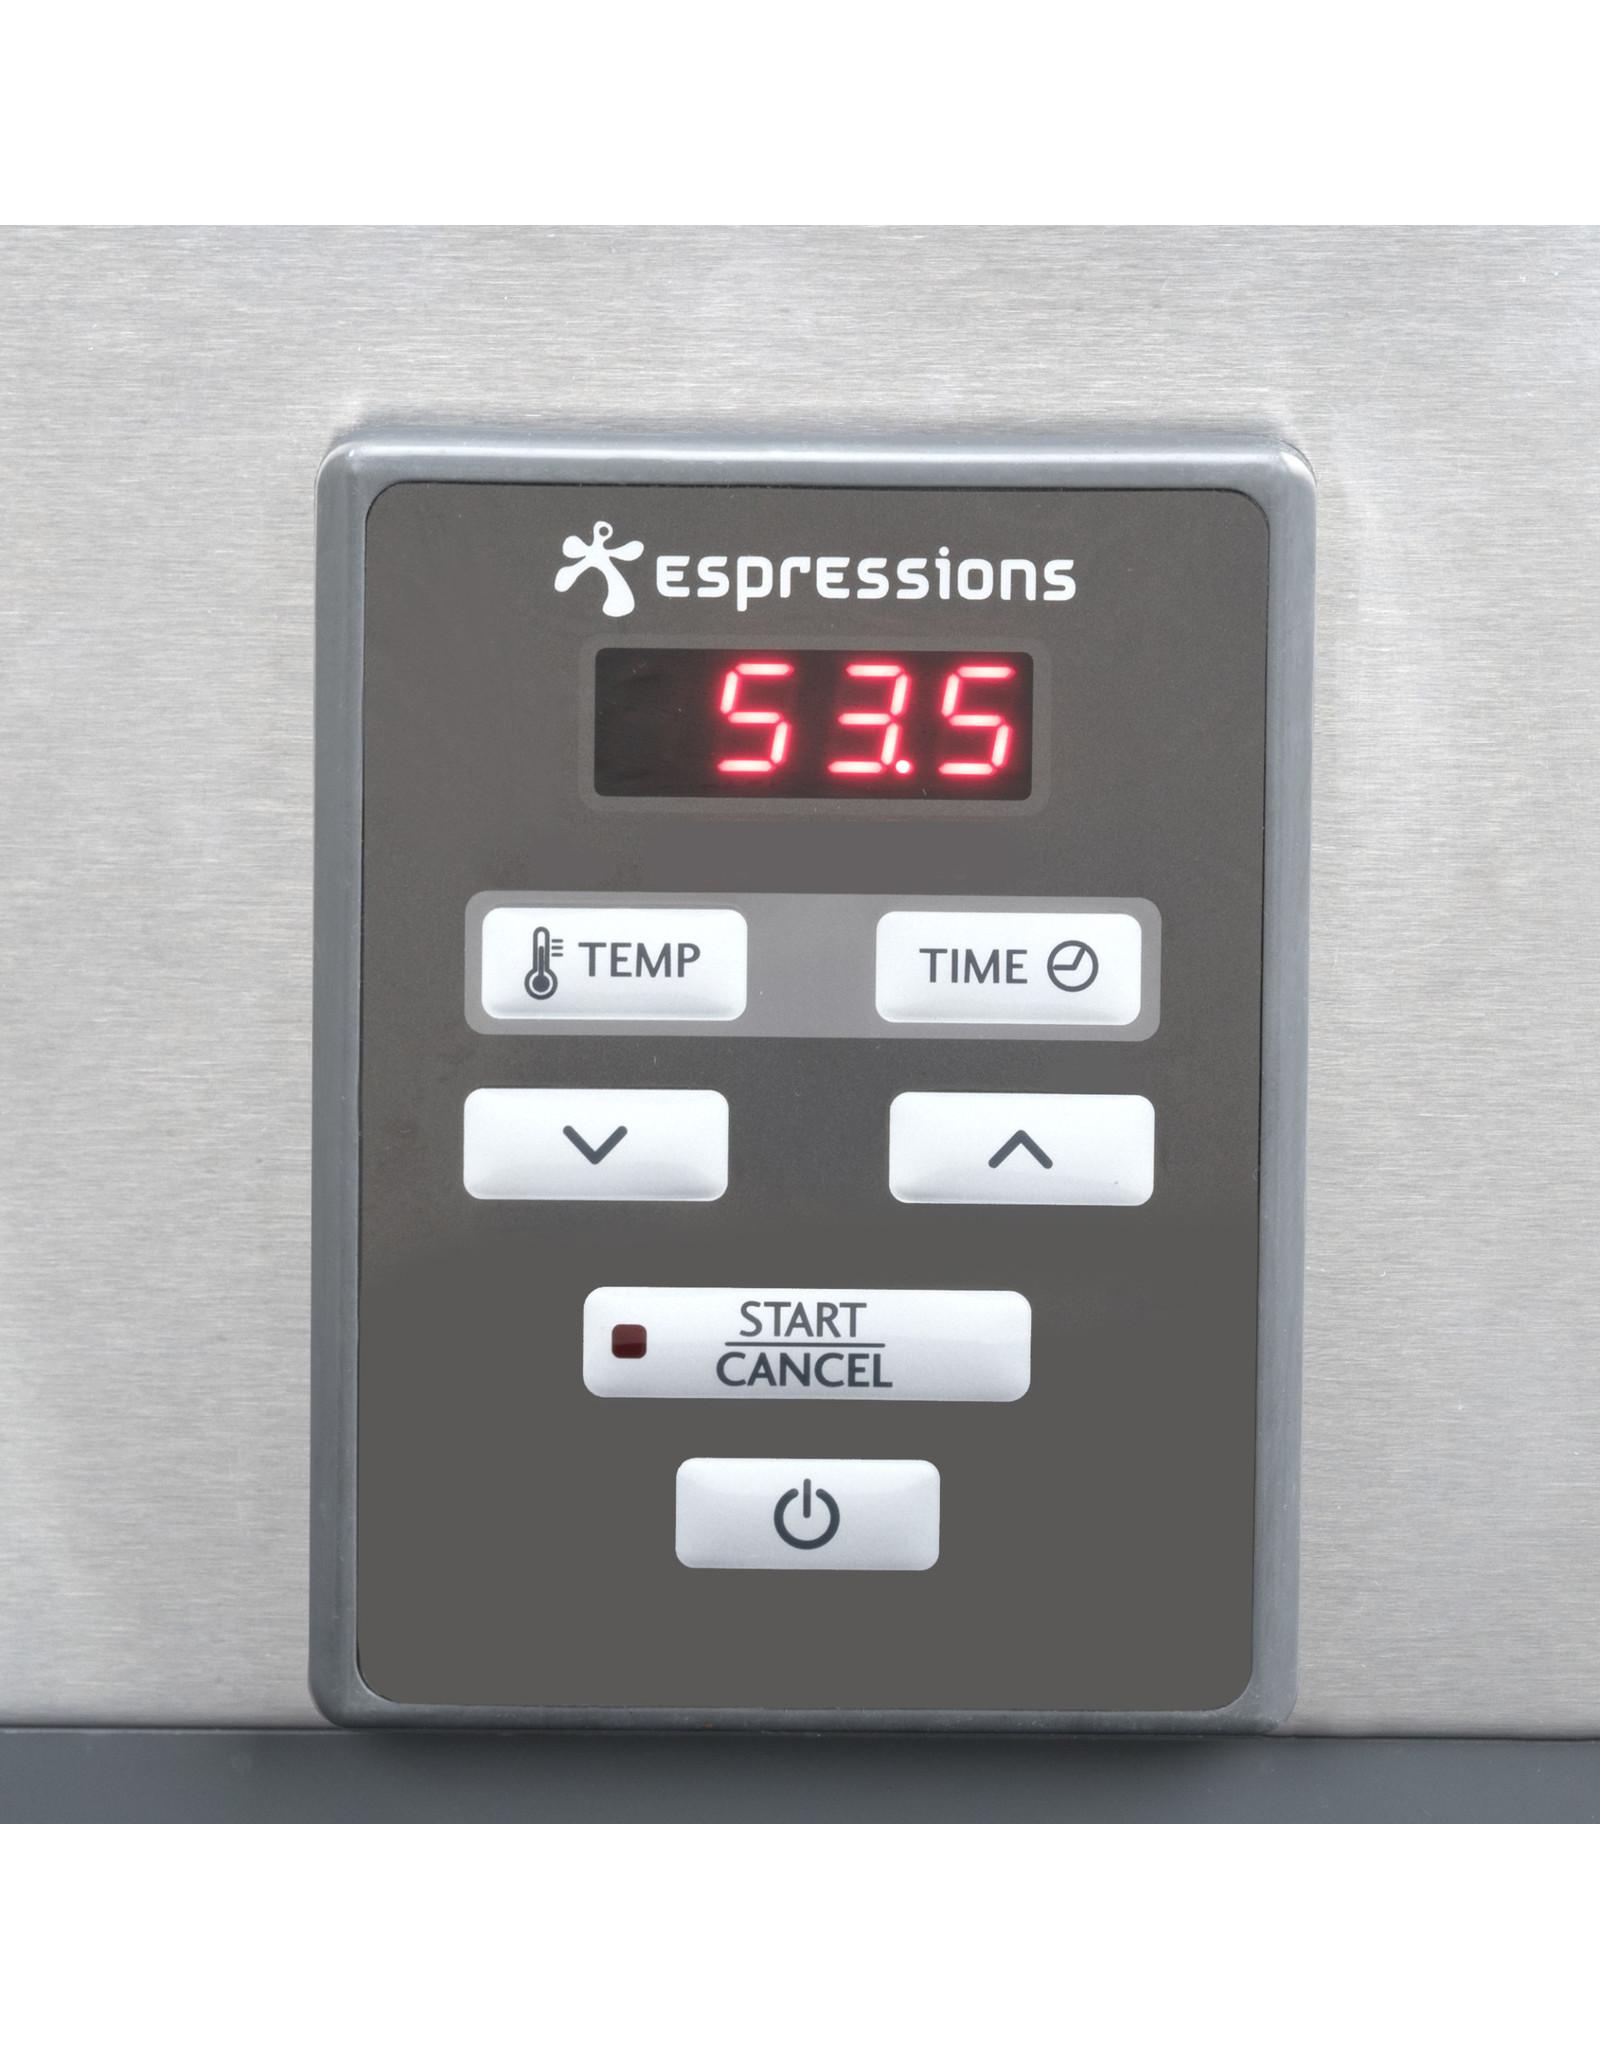 ESPPRESSIONS ESPRESSION EP5000 SMART SOUS-VIDE